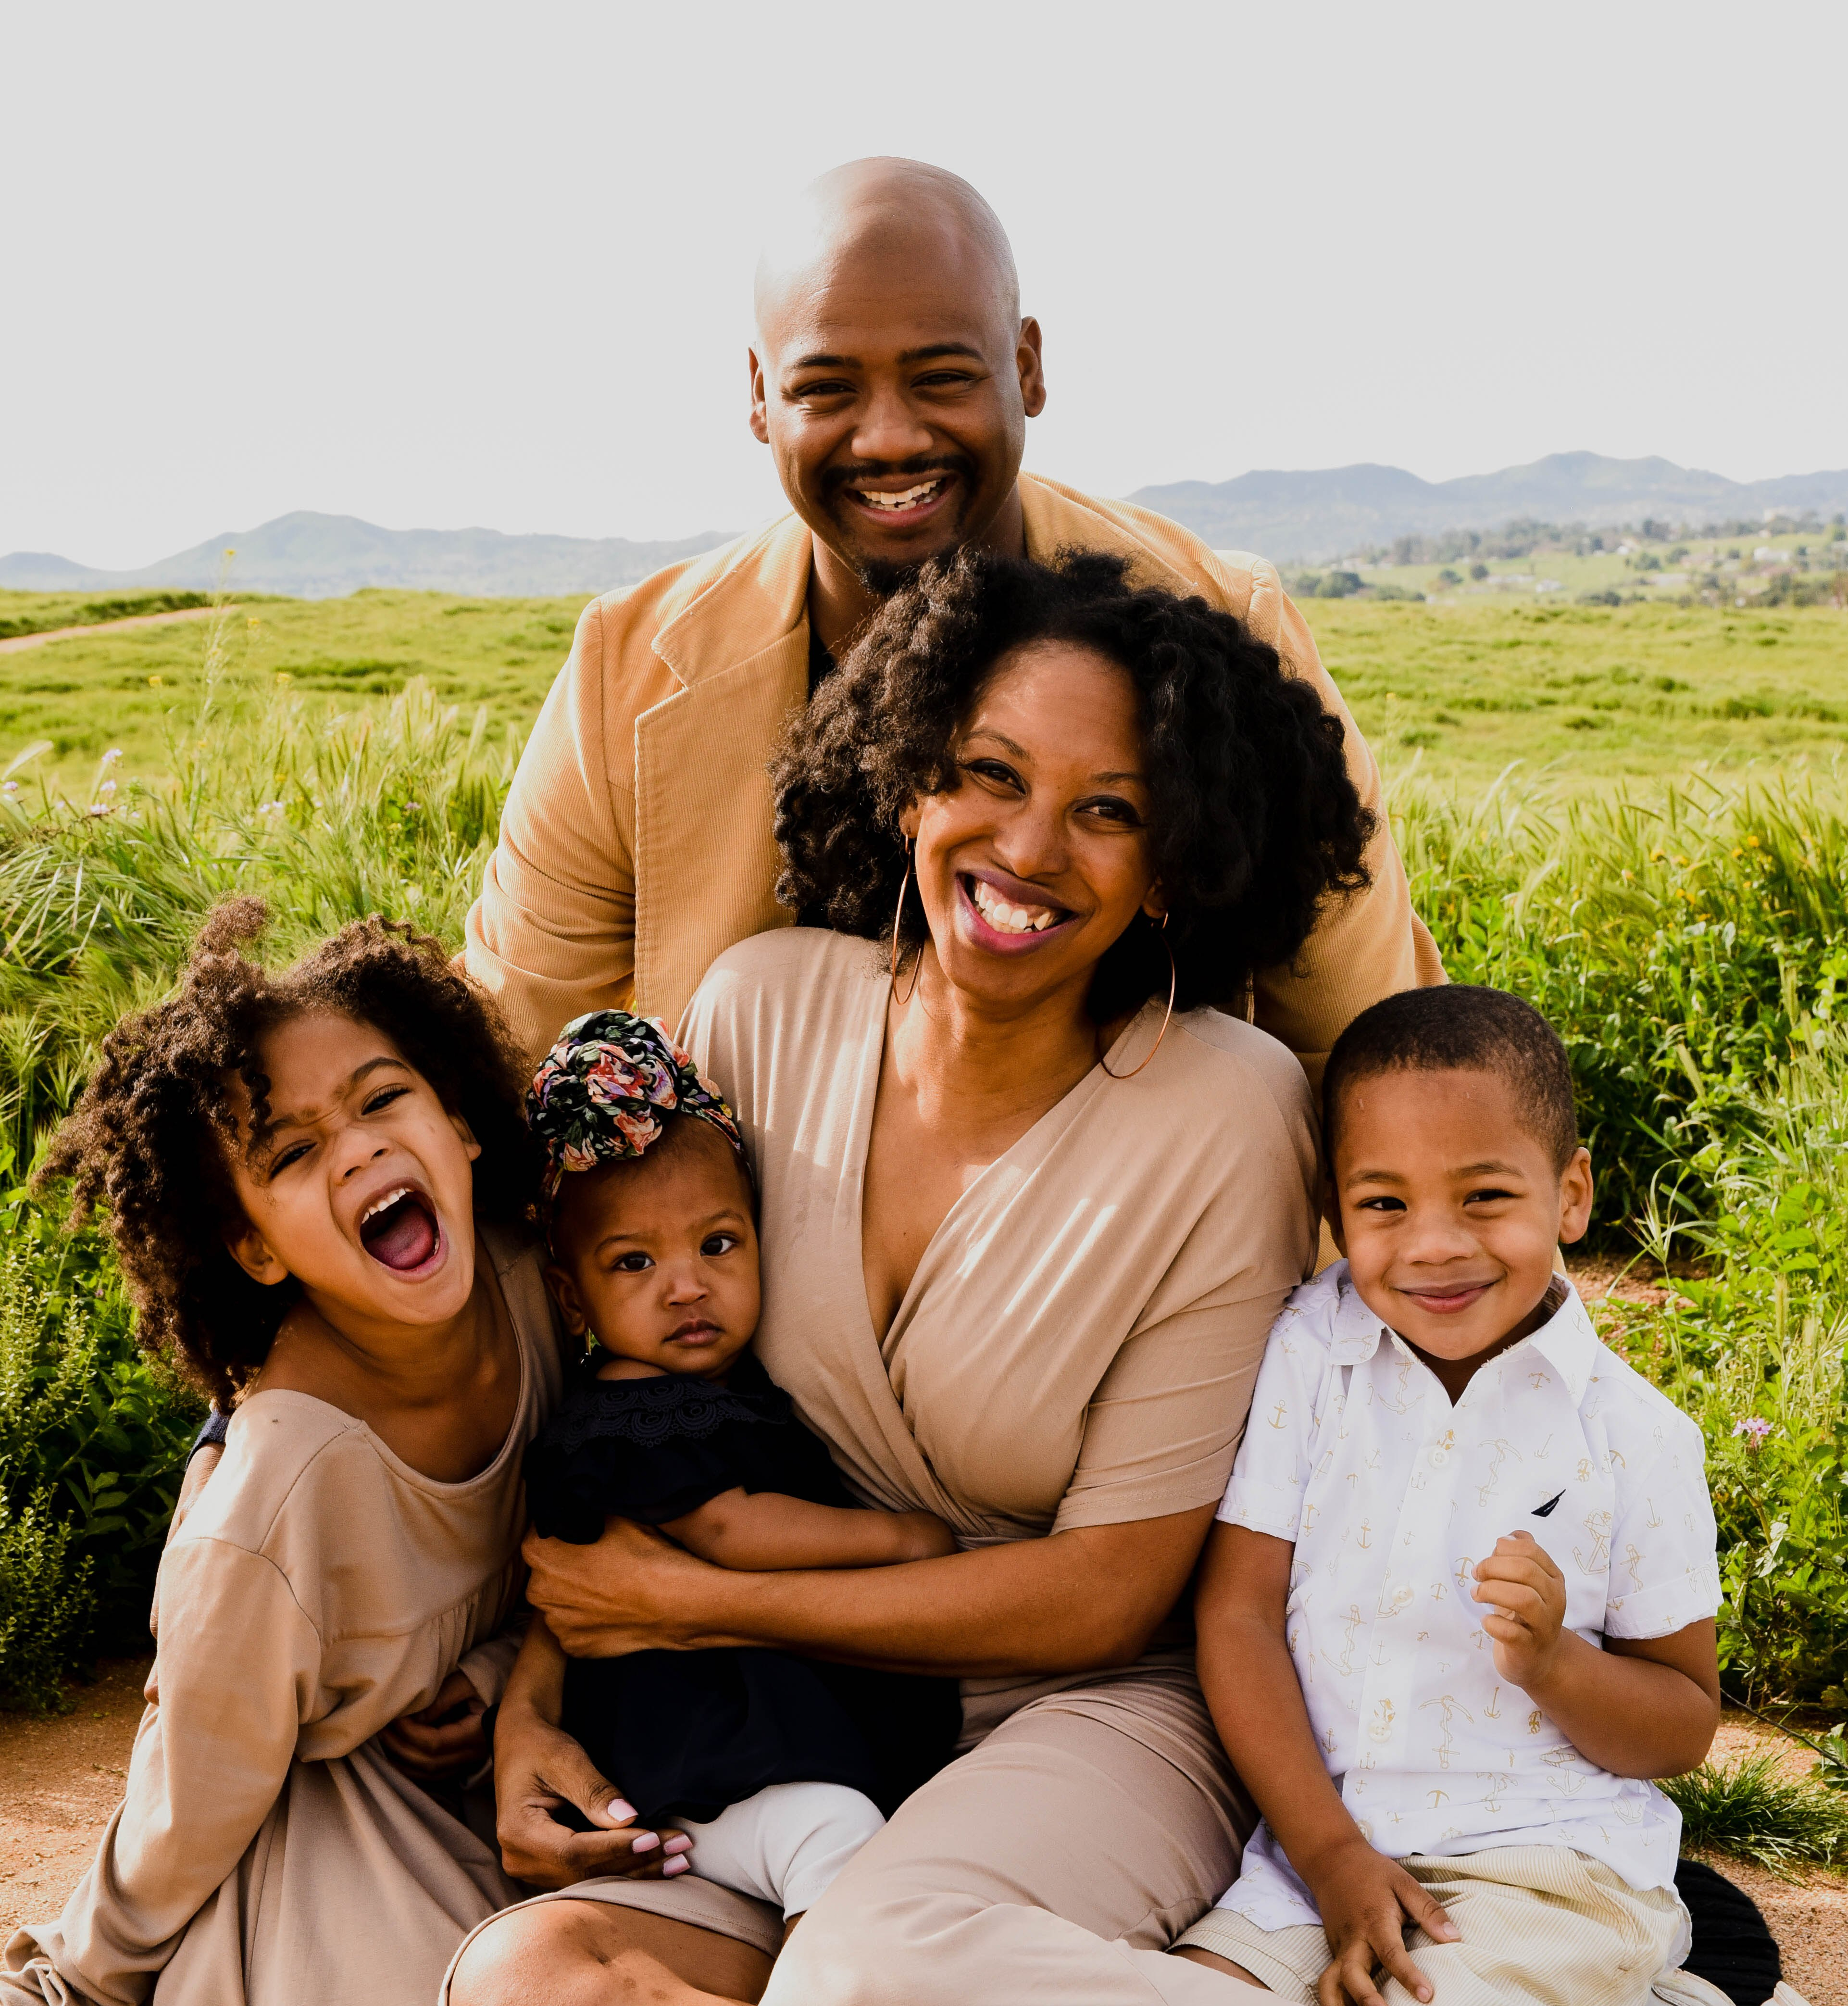 FAMILY (314 of 318)